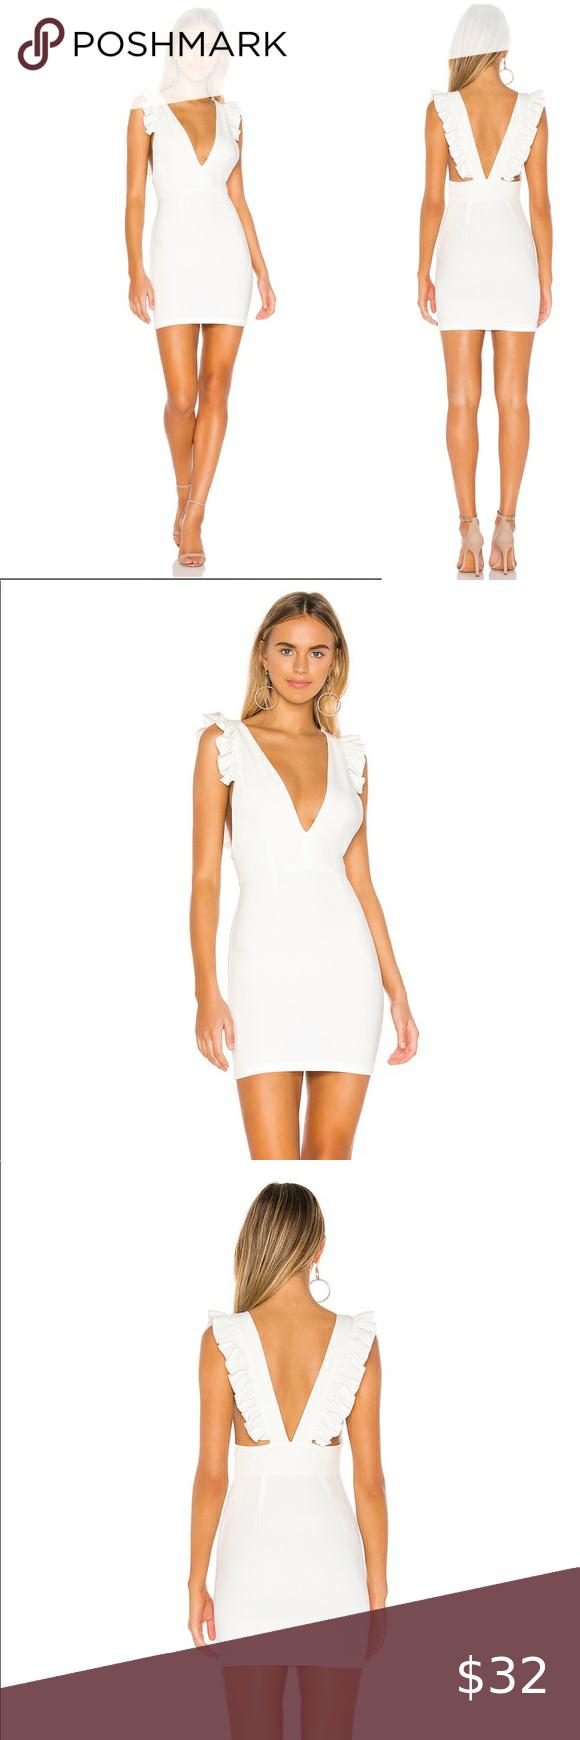 Superdown Drea Mini Dress In White Small N Dress Is Nwt Pet Free Smoke Free Home Superdown Dresses Mini Mini Dress White Dress Clothes Design [ 1740 x 580 Pixel ]